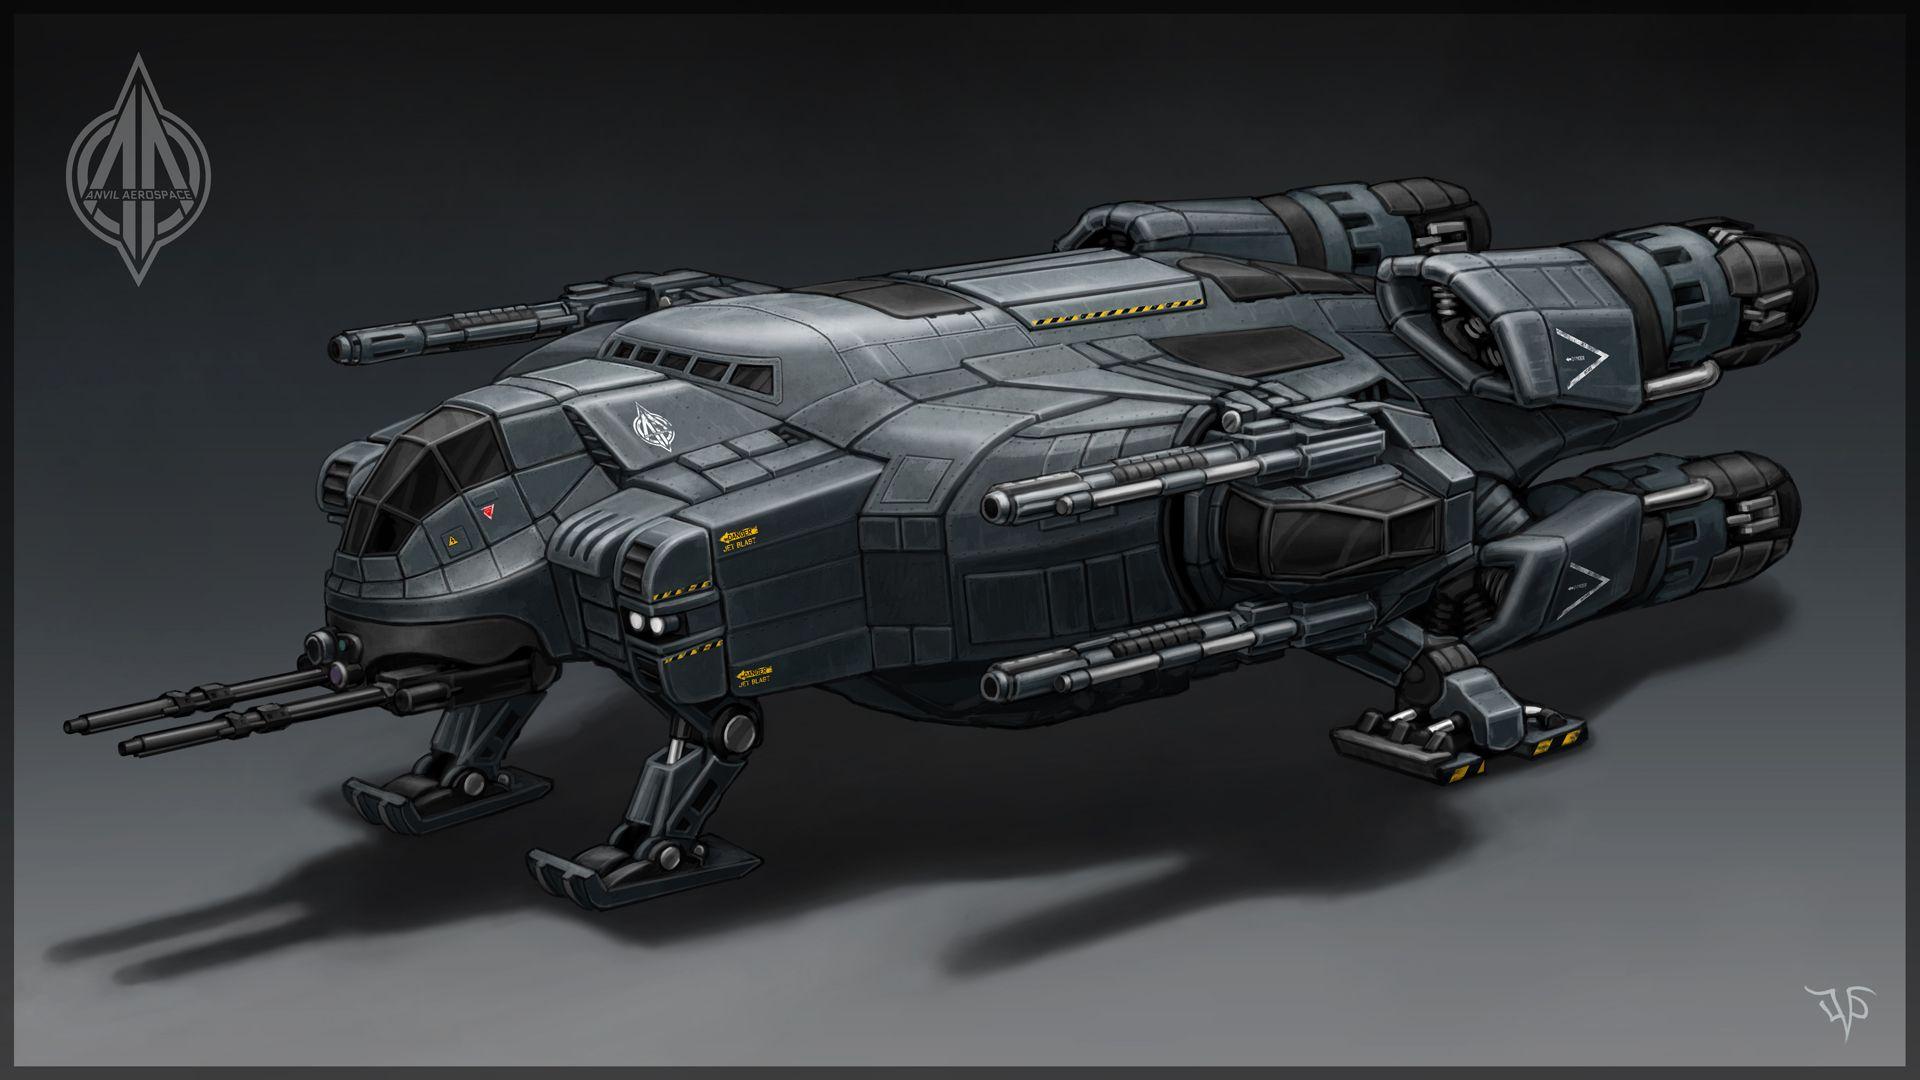 future rocket ship - HD1920×1080